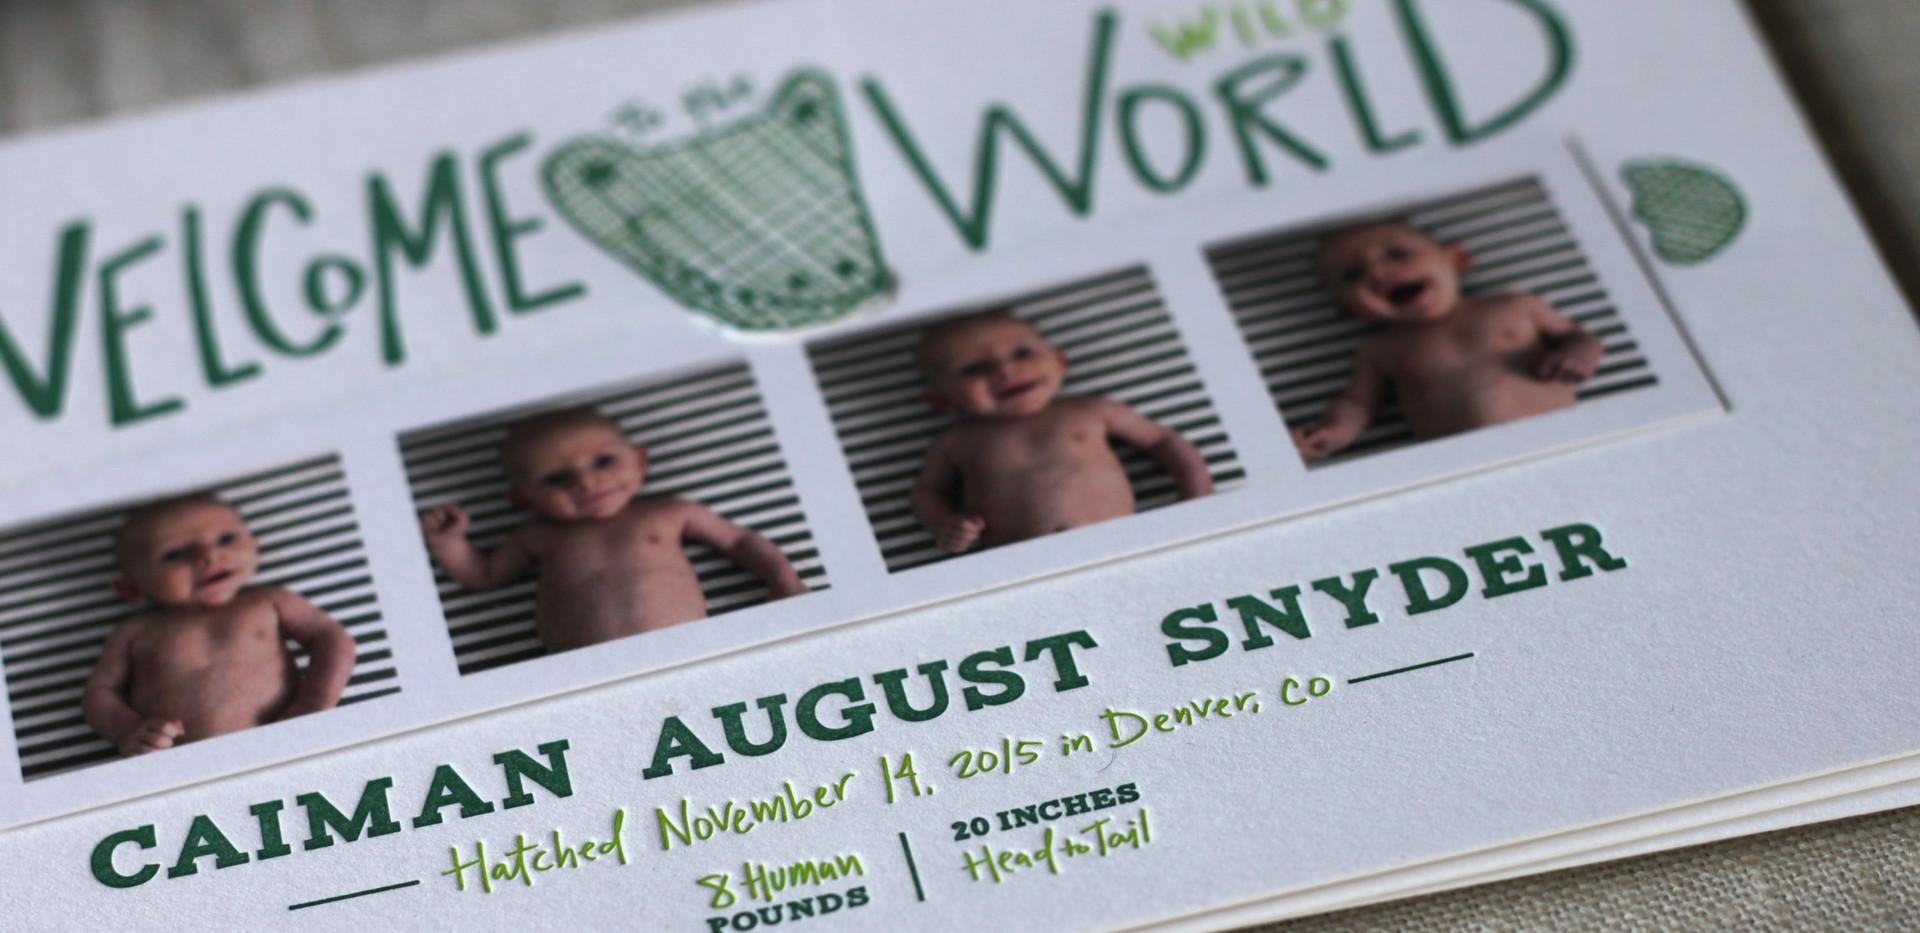 Alligator Birth Announcement